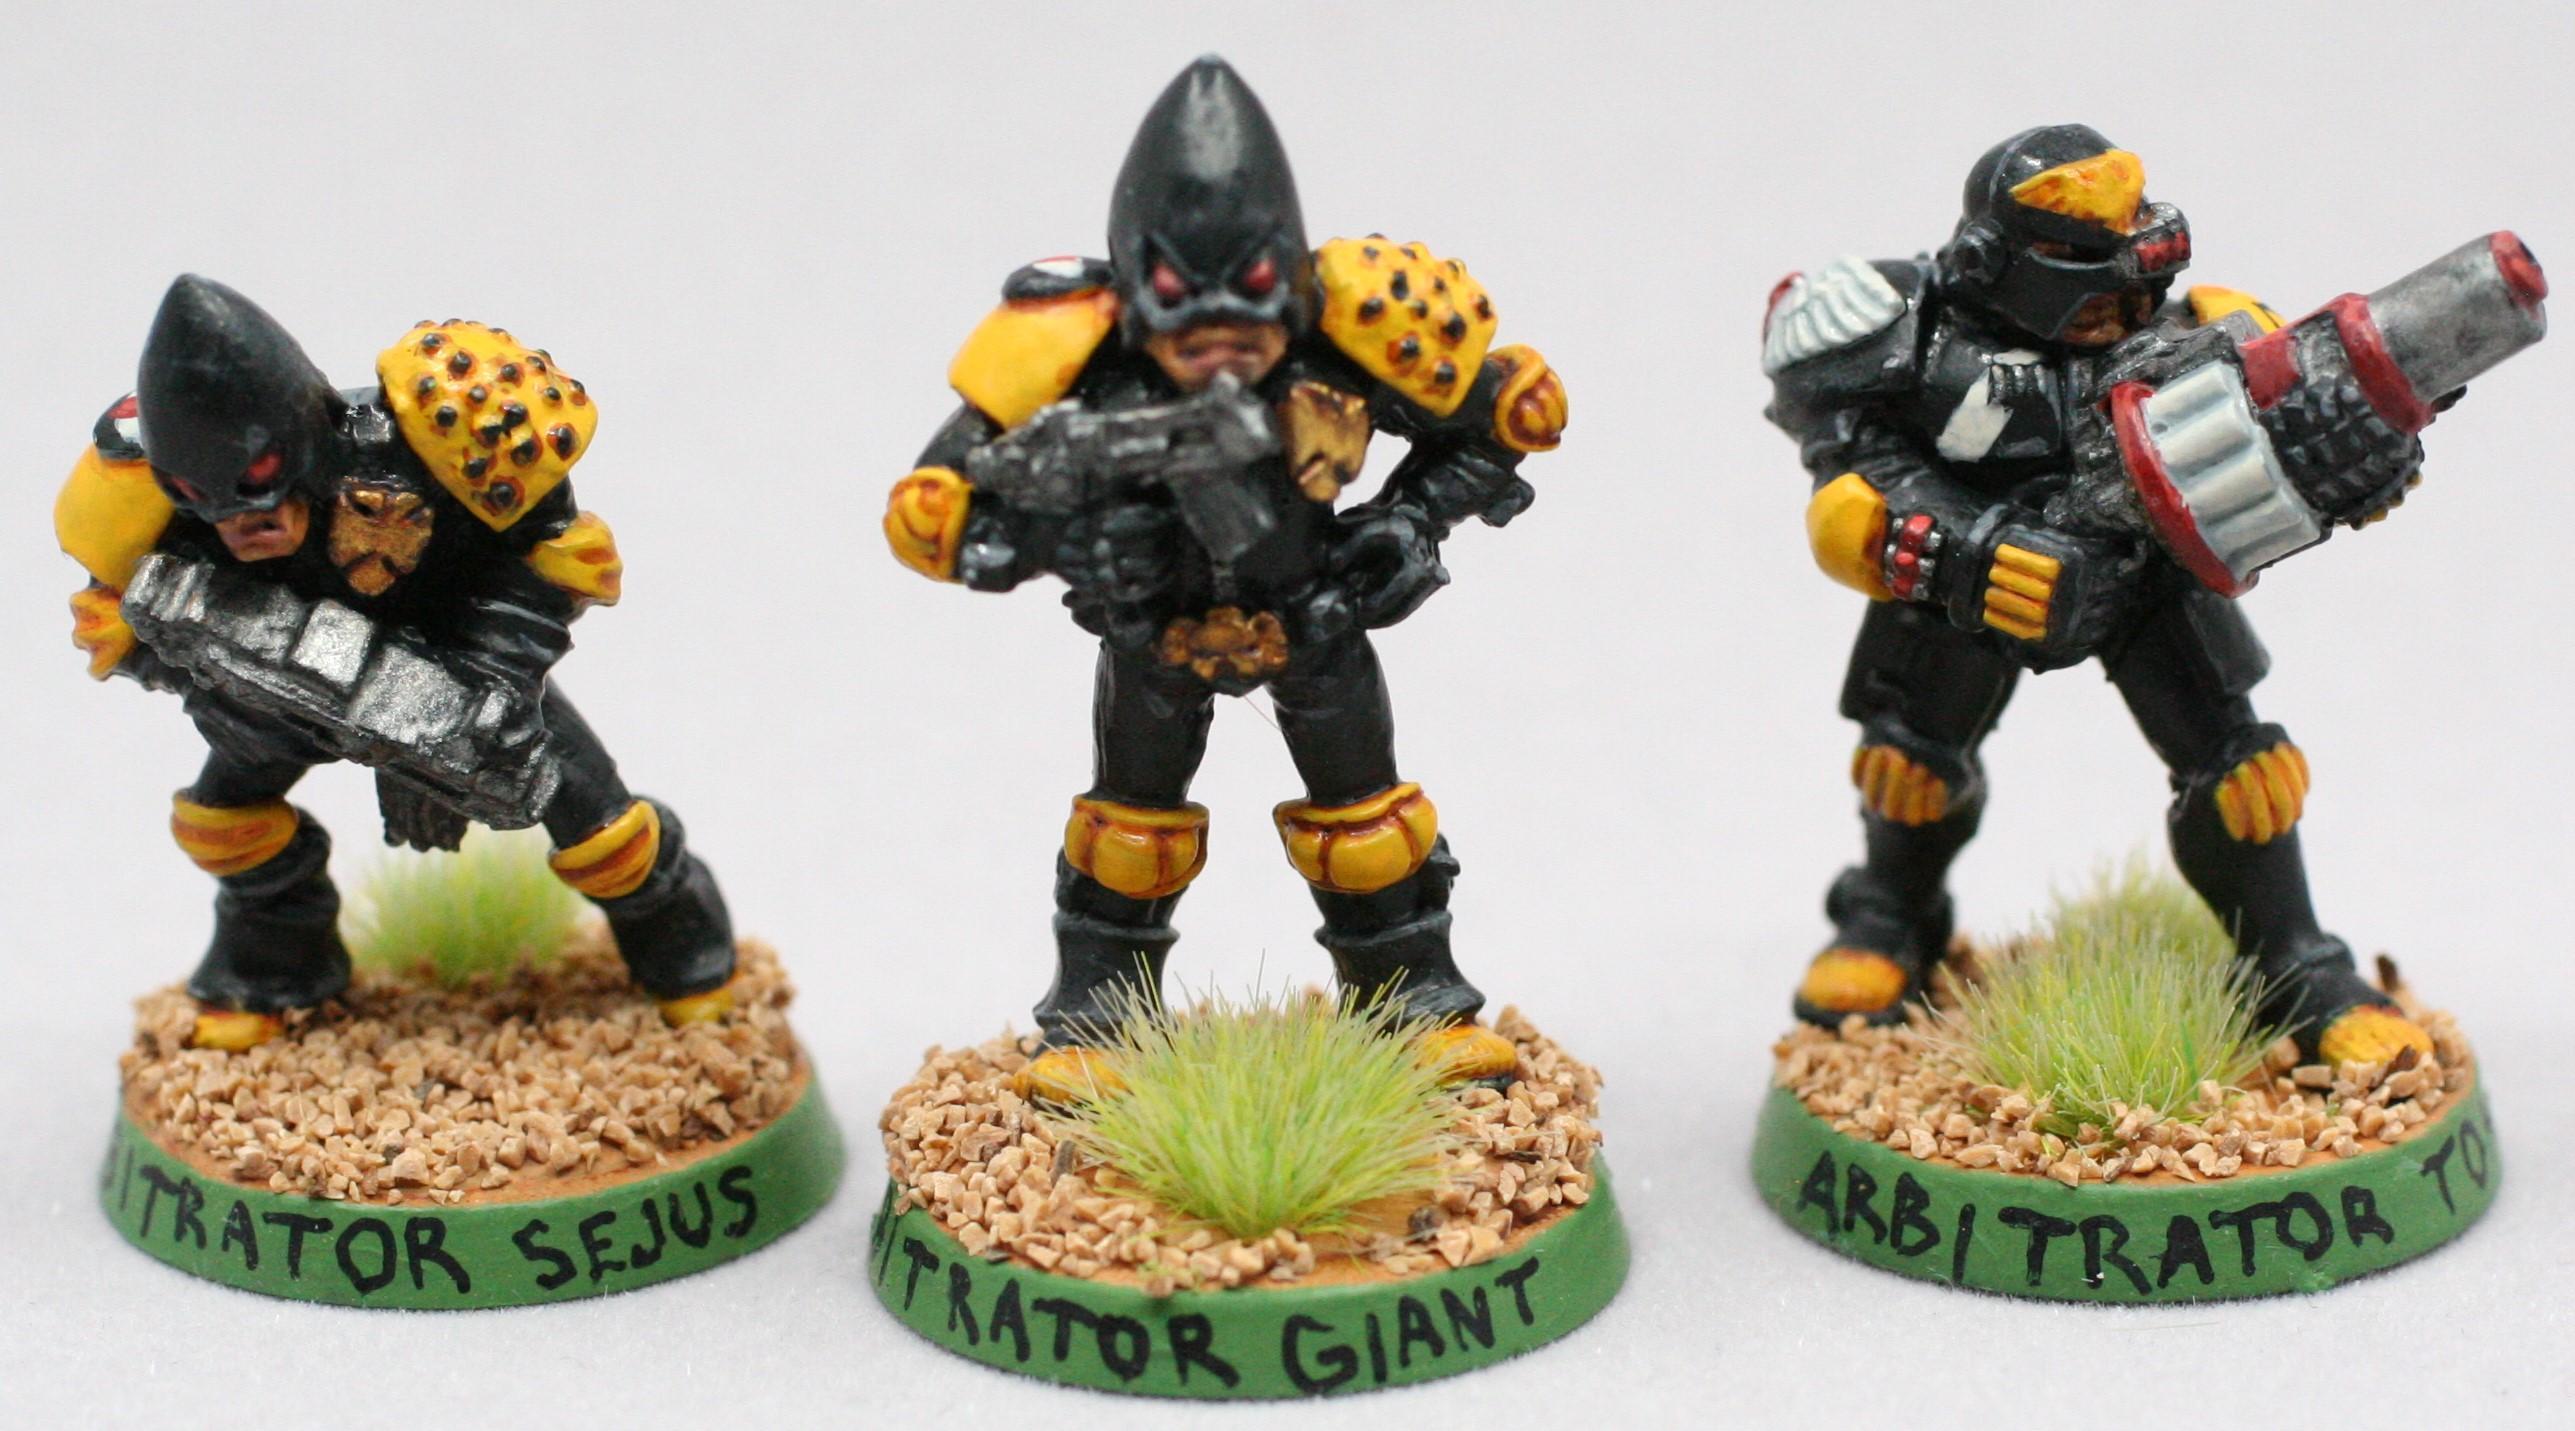 Adeptus Arbites, Judge Dredd, Rogue Trader, Wargames Foundry